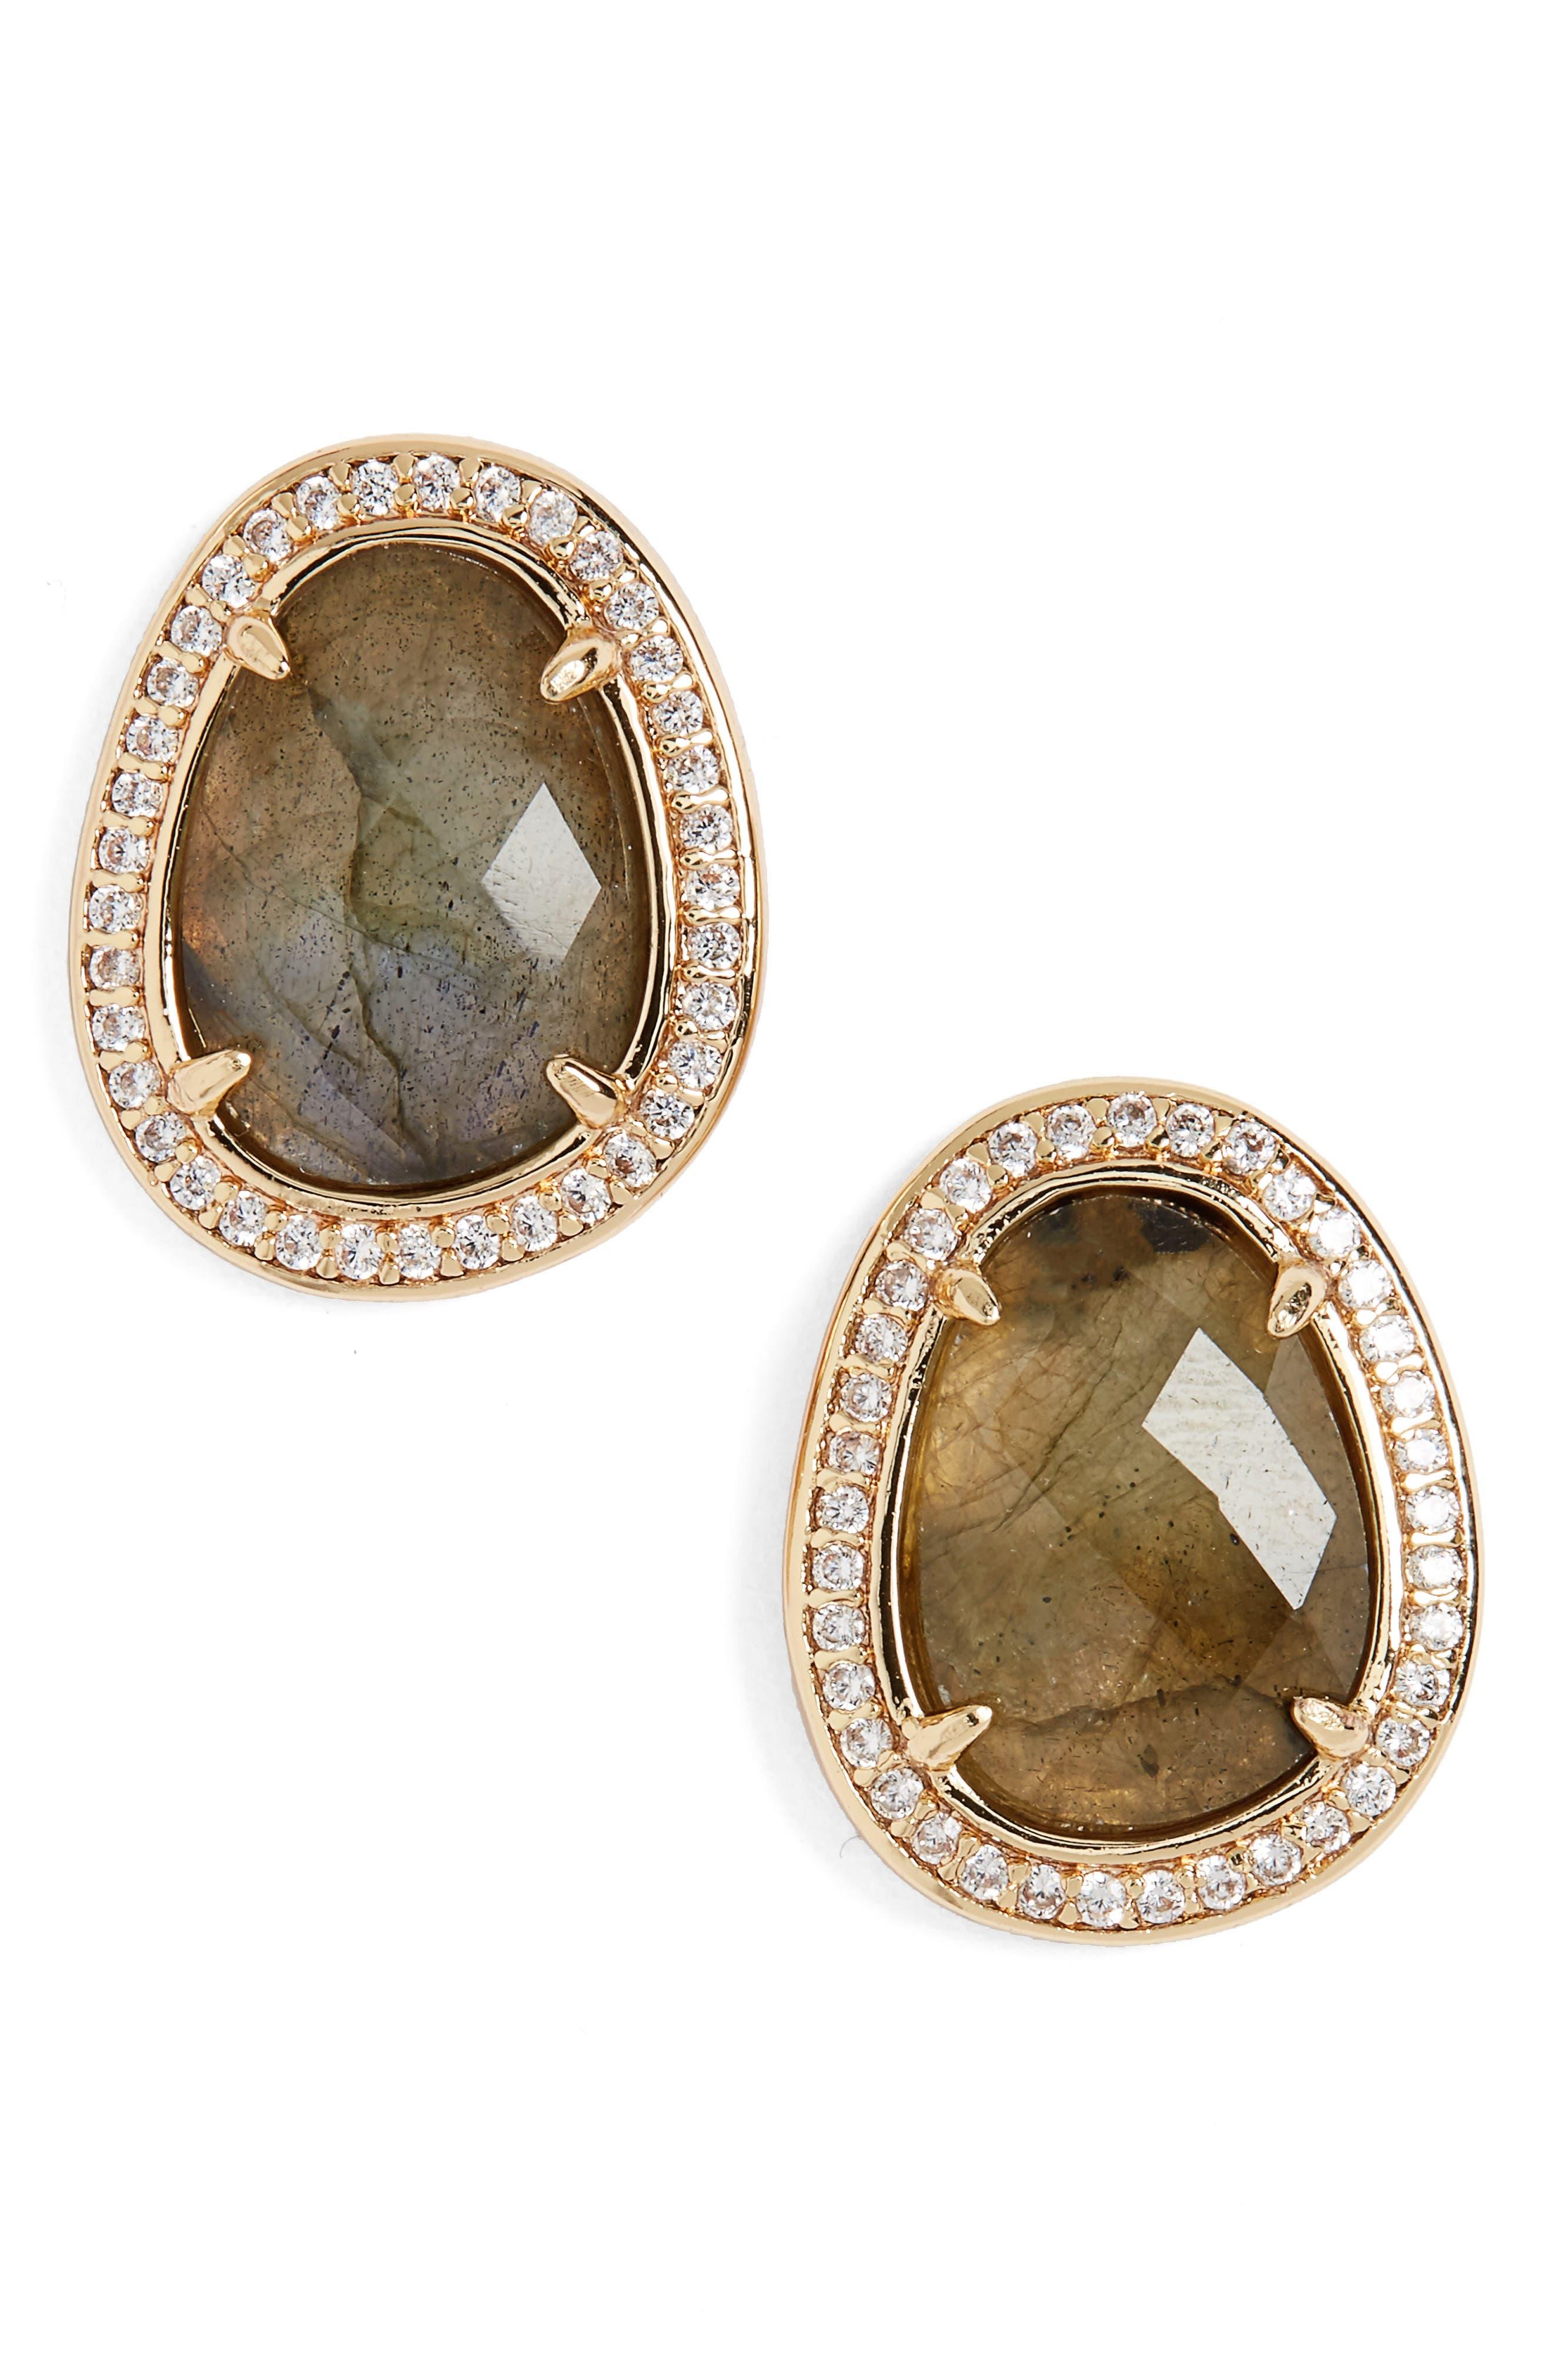 Semiprecious Stone Stud Earrings,                             Main thumbnail 1, color,                             Labradorite/ Gold